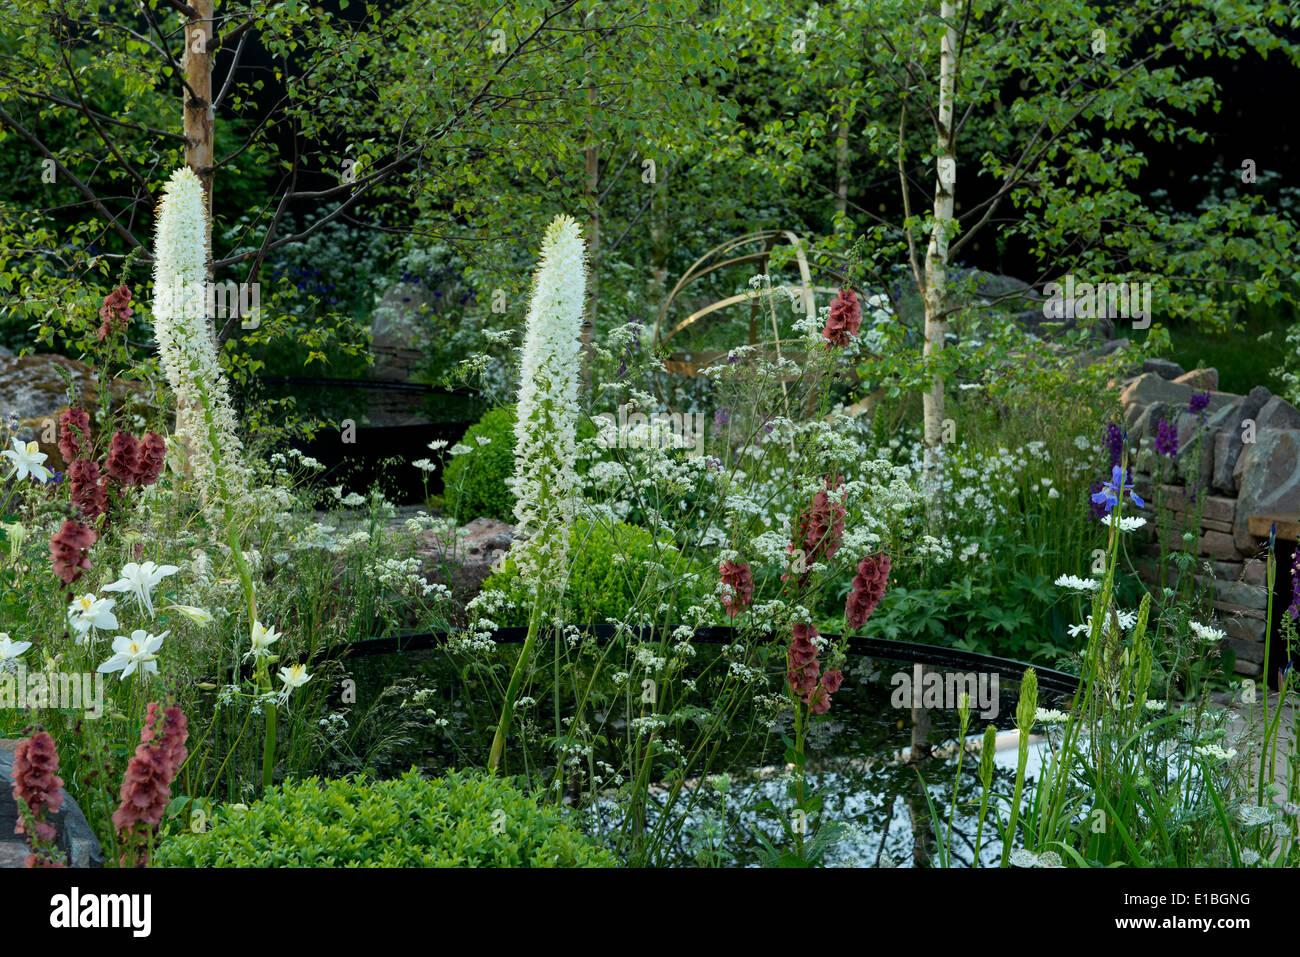 The Vital Earth Night Sky Garden, a gold medal winner at The Chelsea Flower Show 2014, London, UK - Stock Image